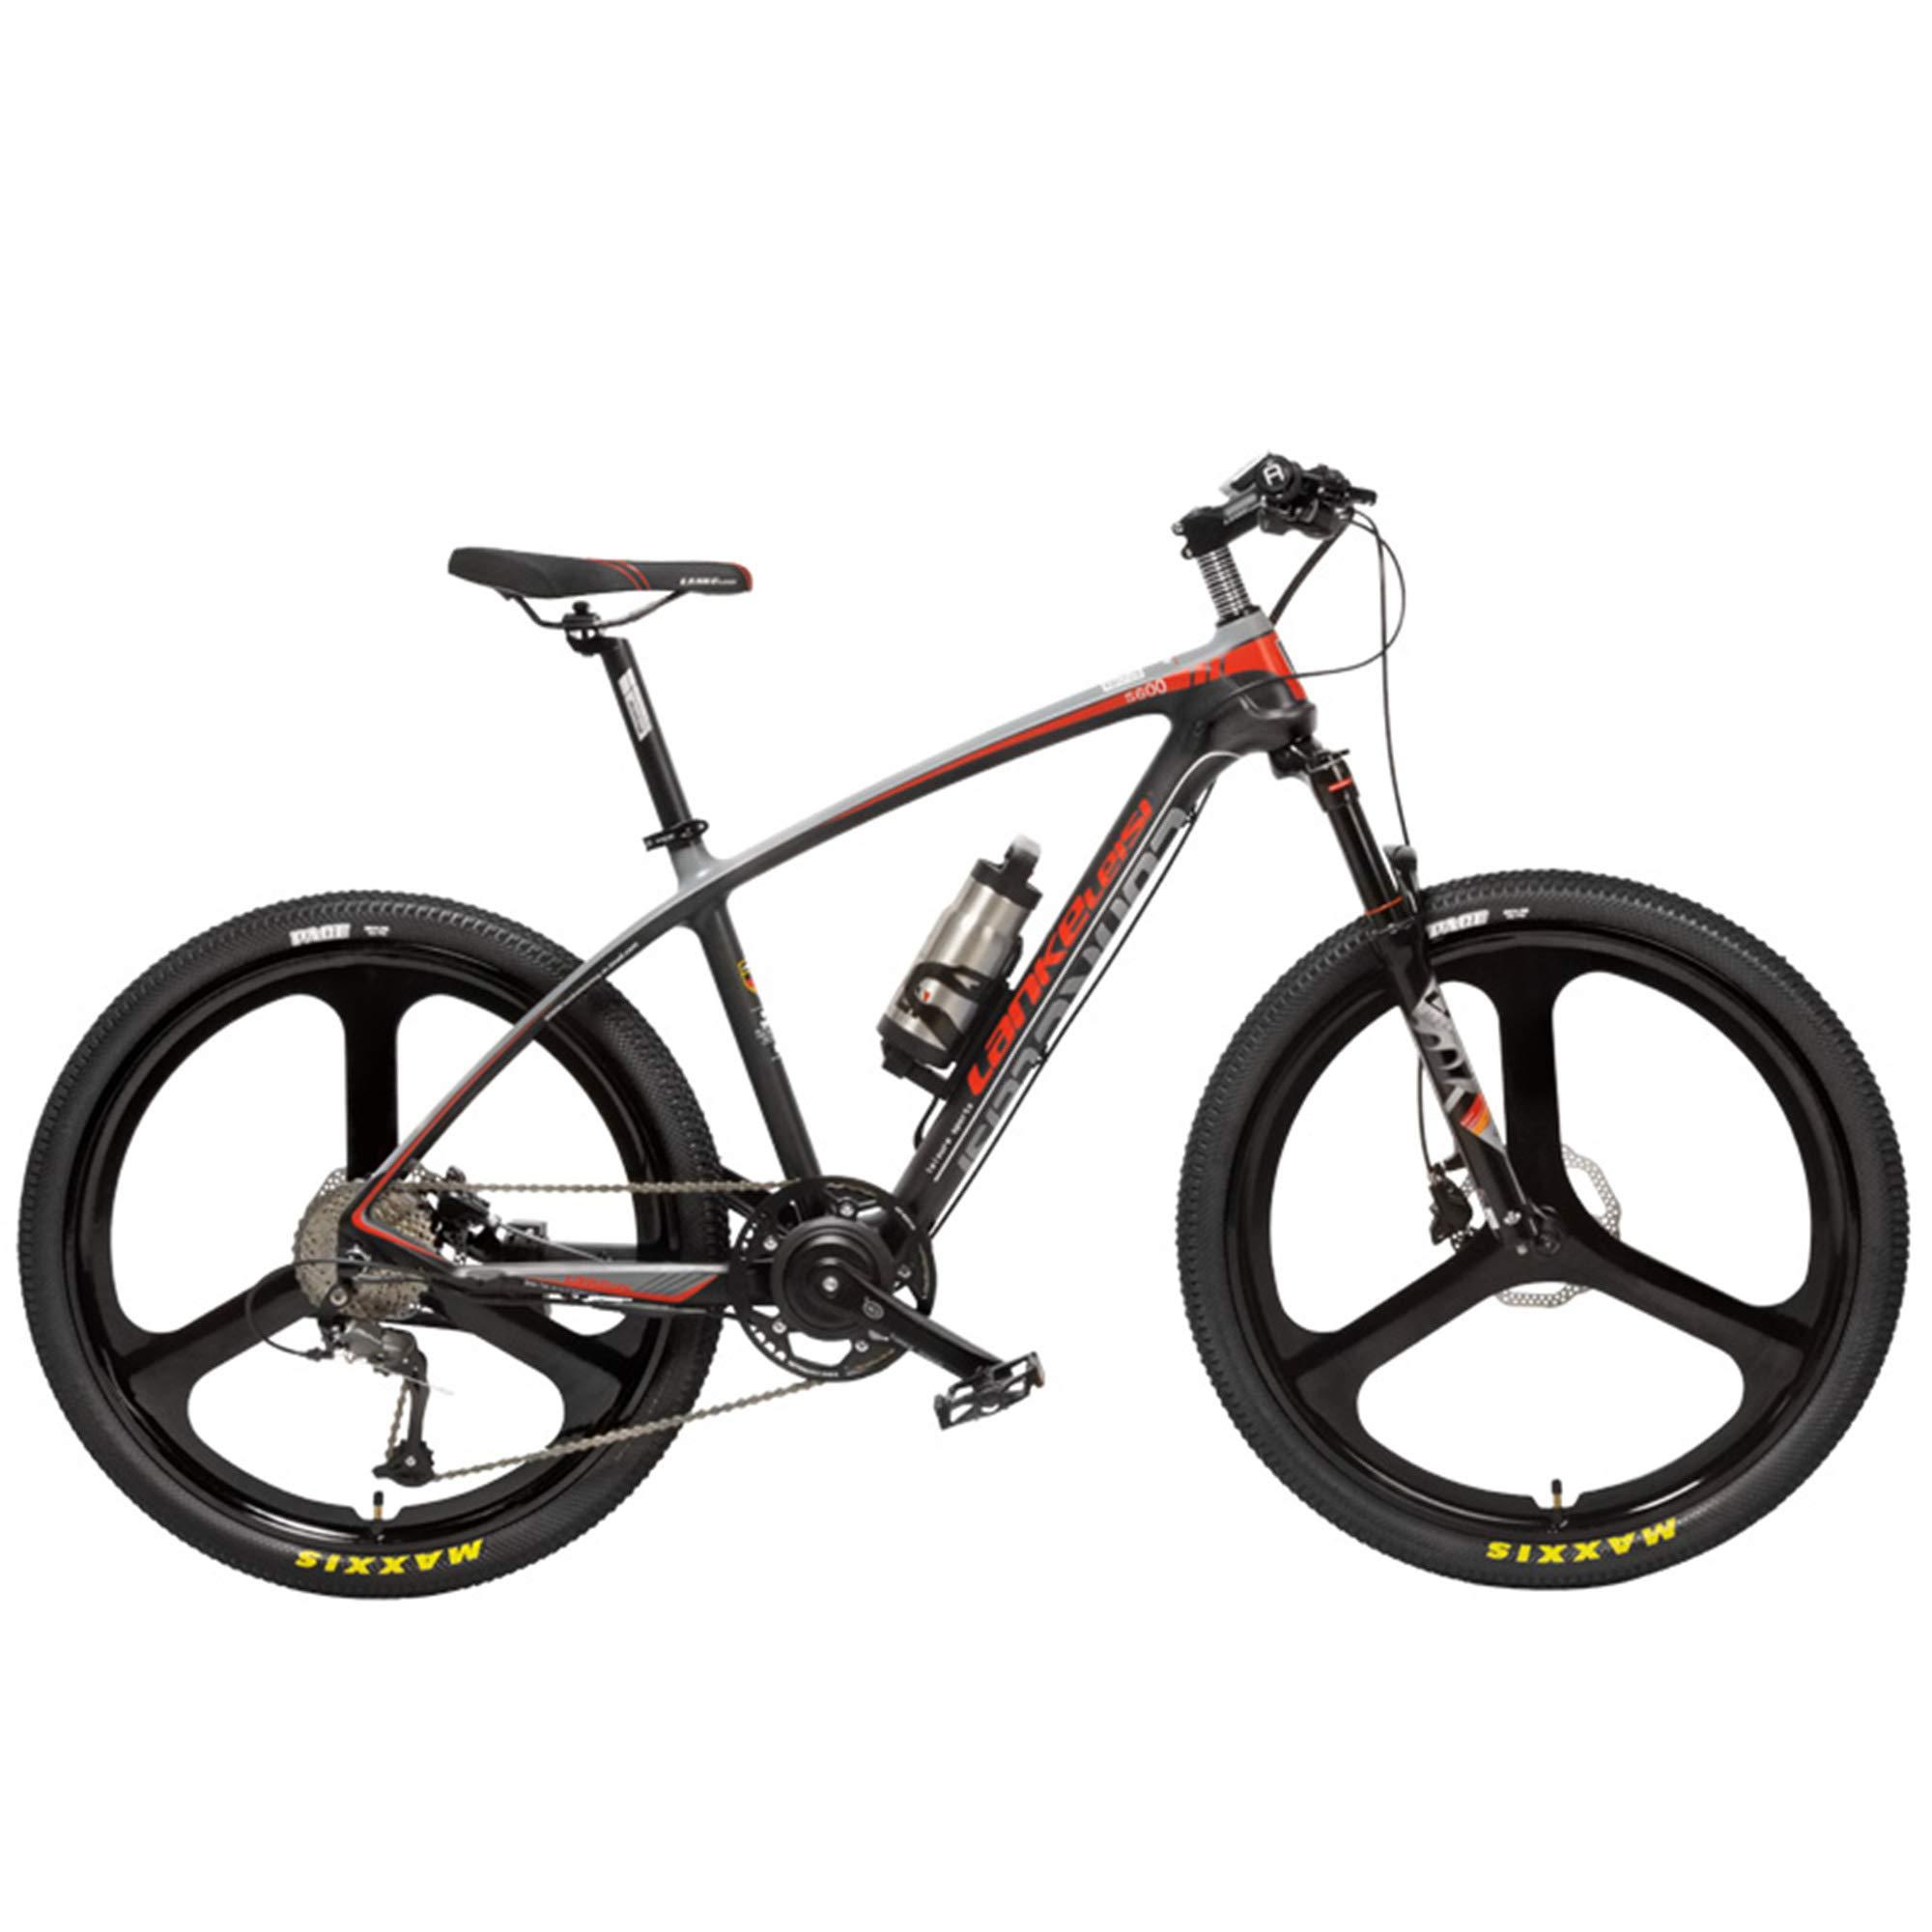 LANKELEISI S600 Bicicleta eléctrica de 26 Pulgadas 240W, Cuadro ...